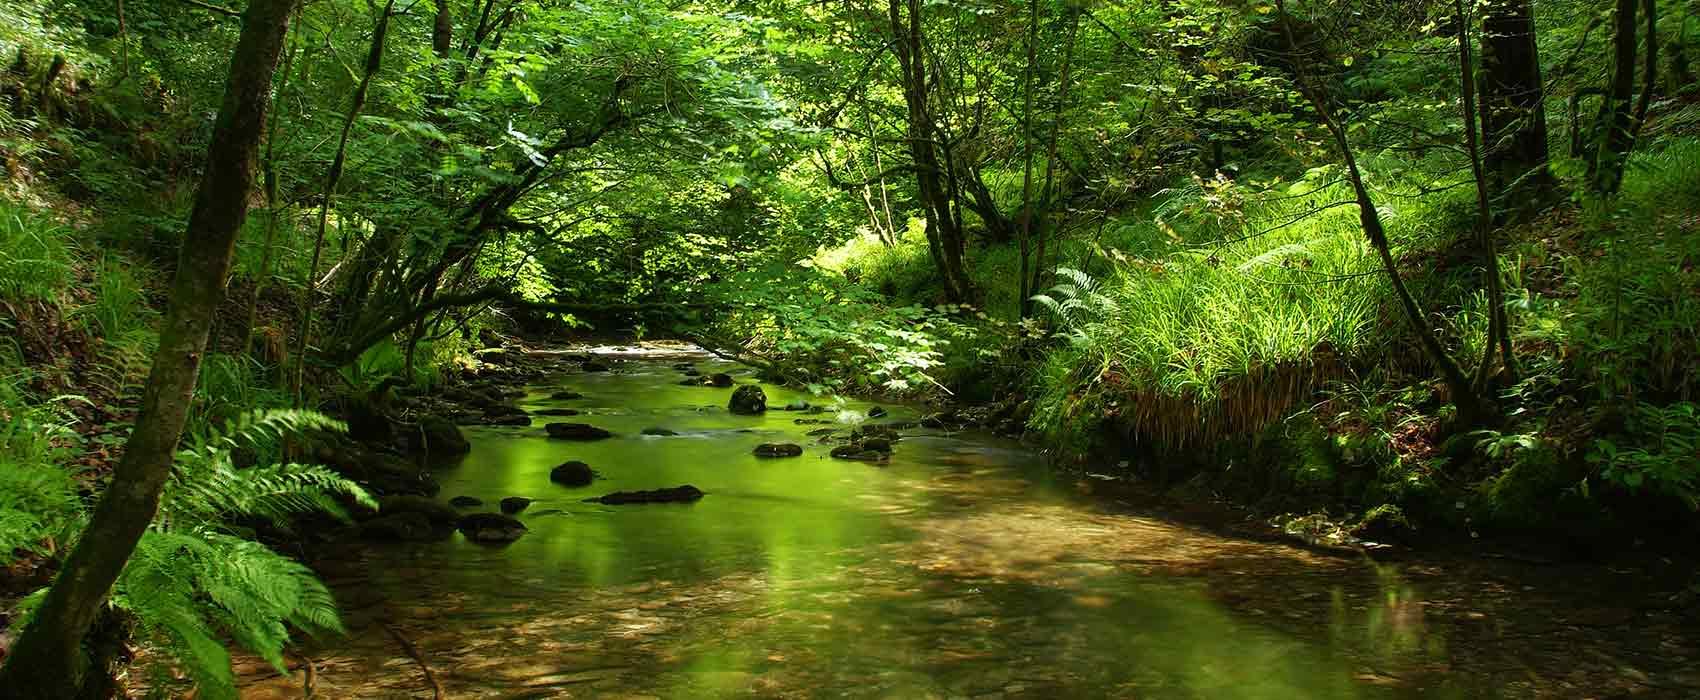 Devon river in wooded area